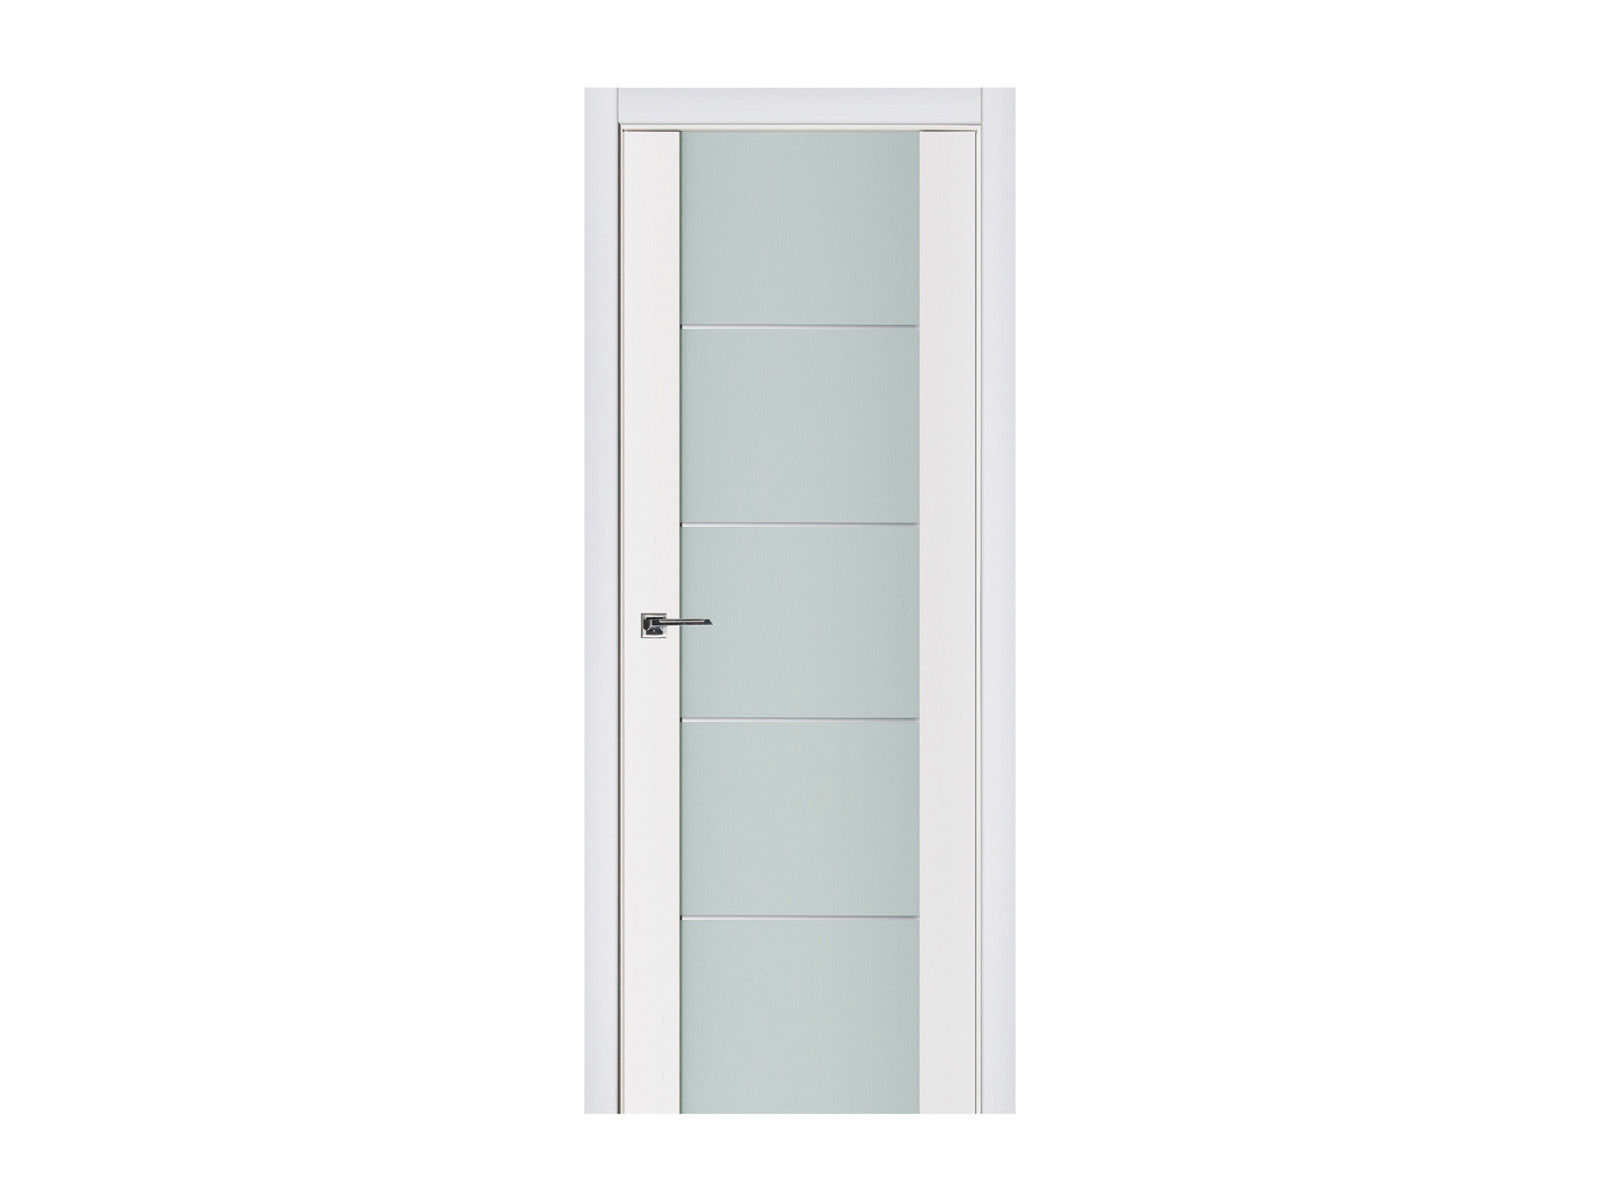 Triplex 007 white wood lacquered modern interior door for 007 door locks